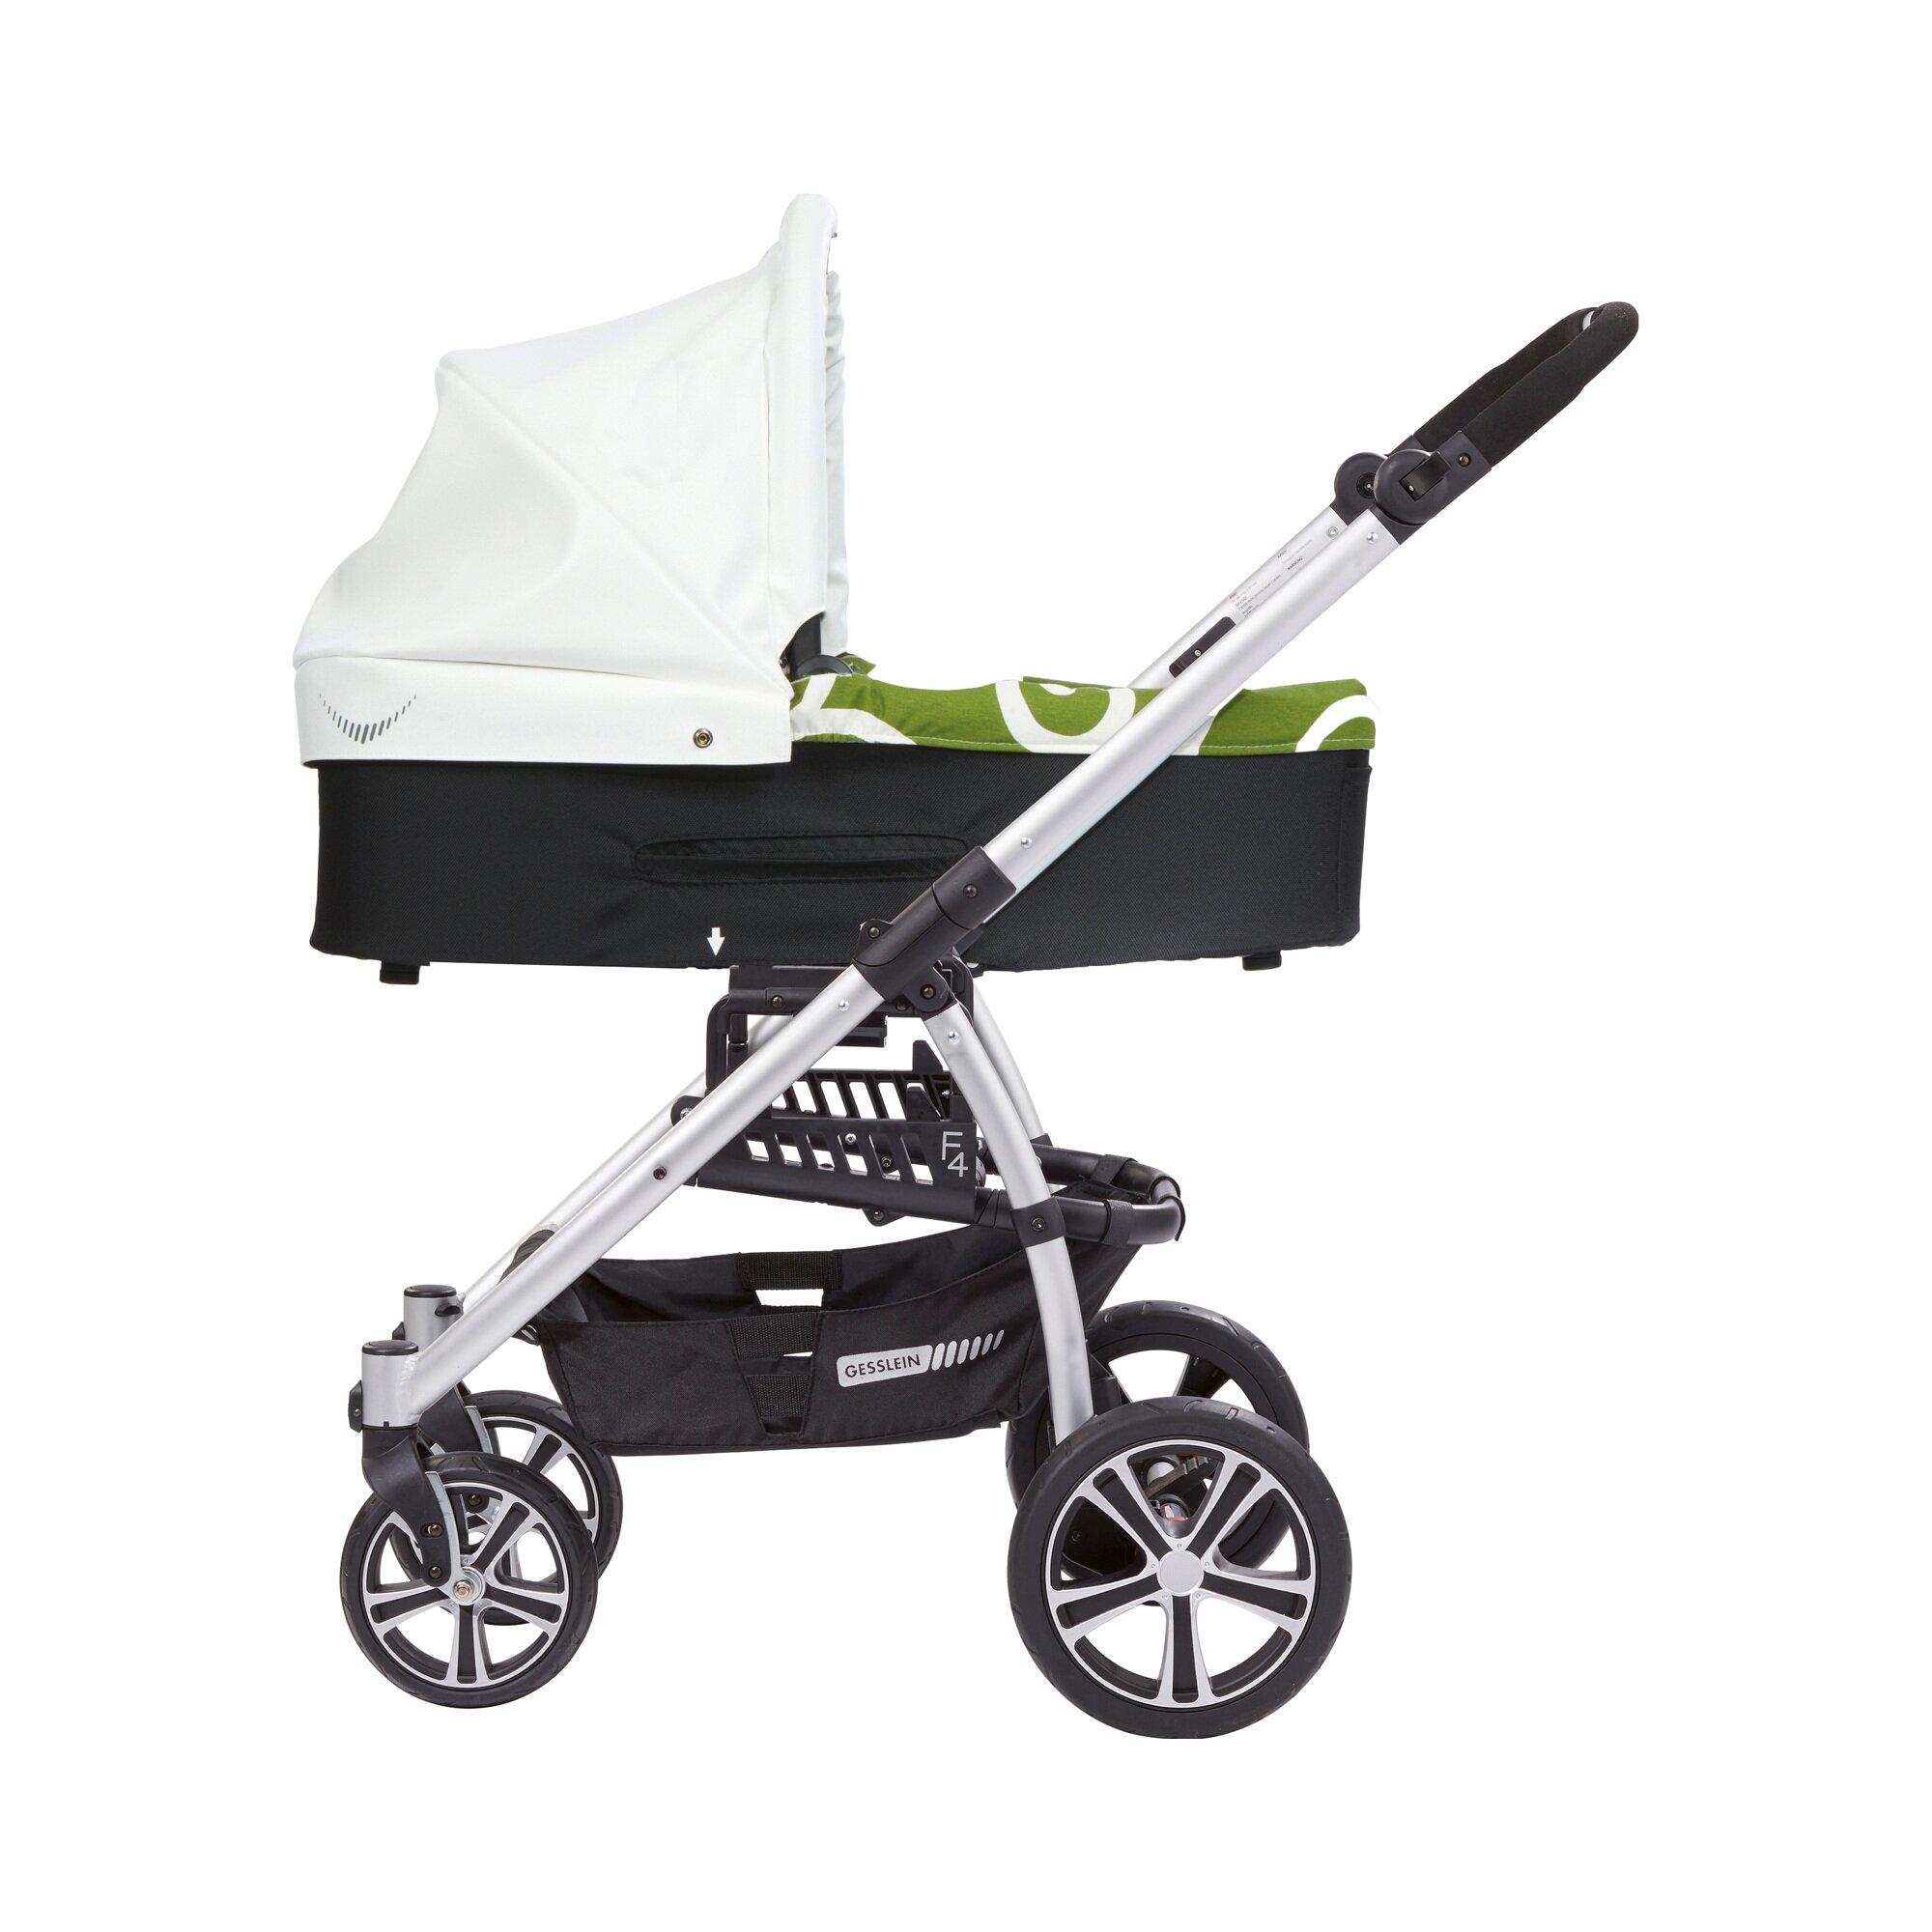 gesslein-maxi-cosi-adapter-fur-kinderwagen-der-f-serie-m-serie-s-serie, 26.99 EUR @ babywalz-de